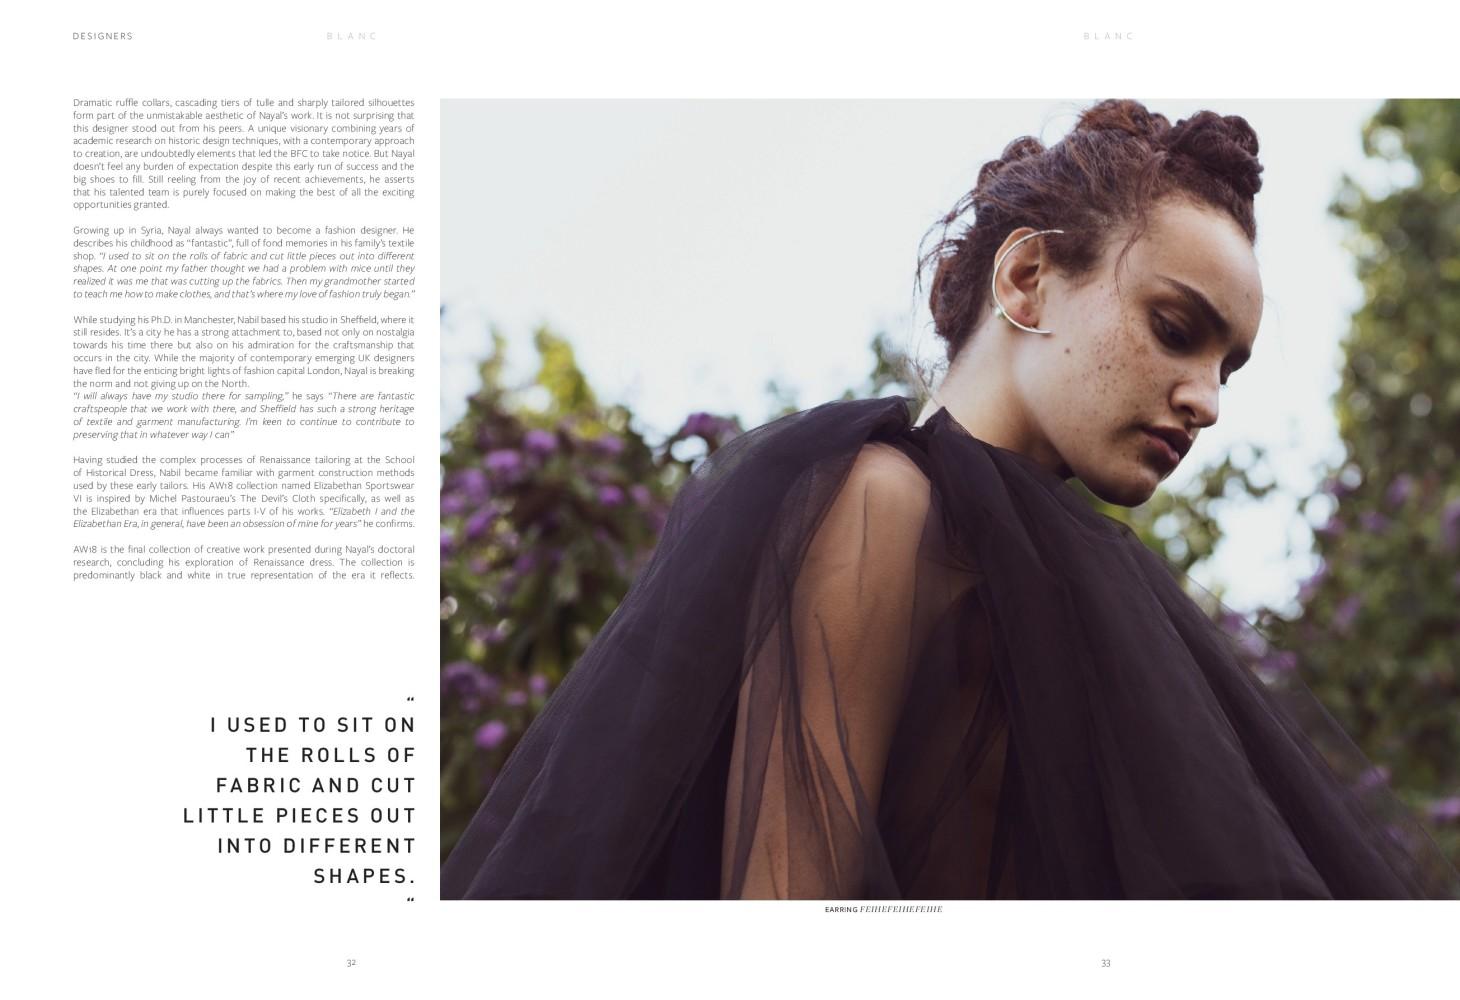 Simone for Blanc Magazine #7